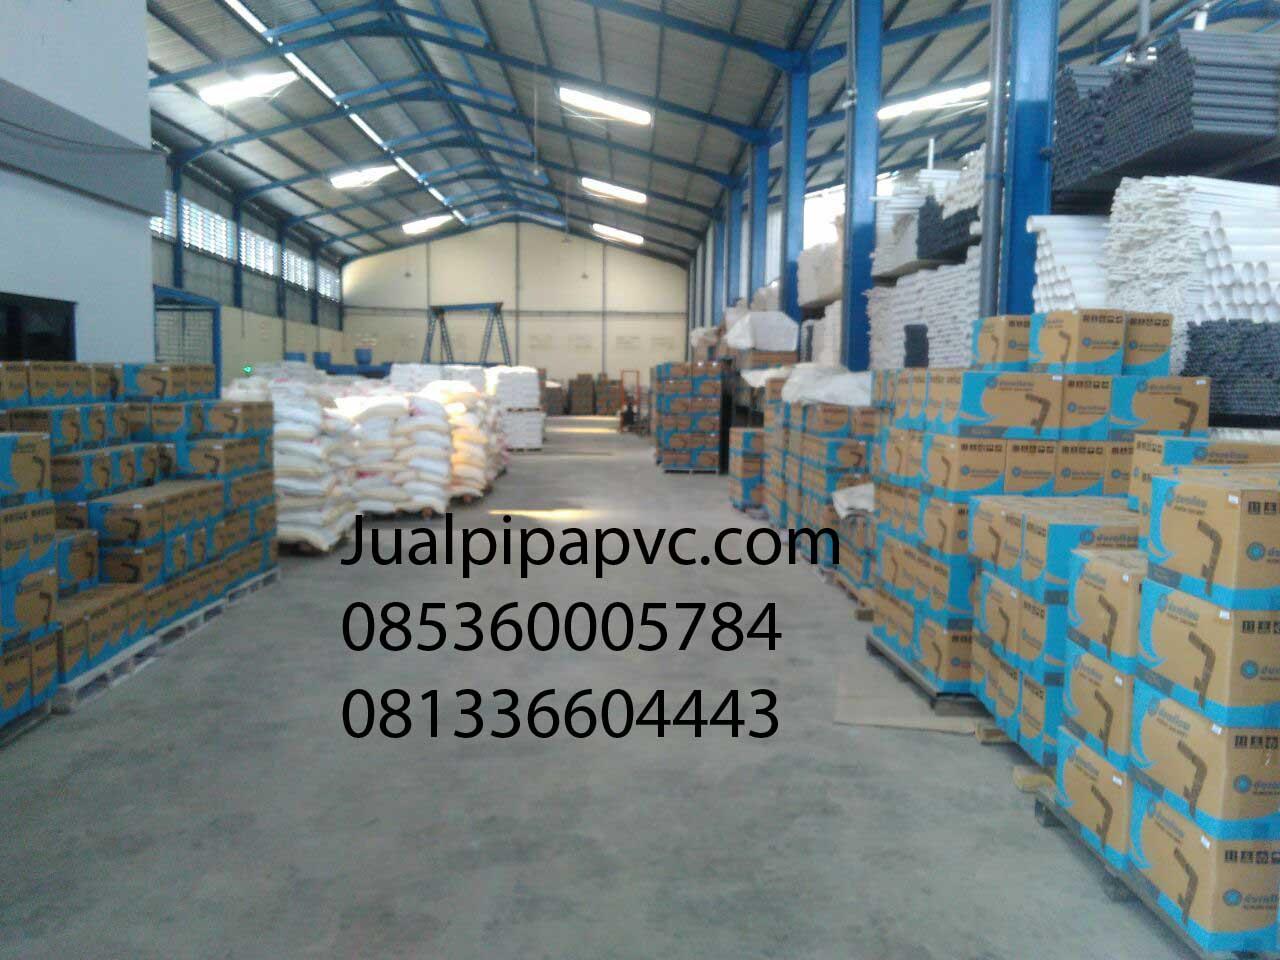 Distributor Pabrik PVC Surabaya